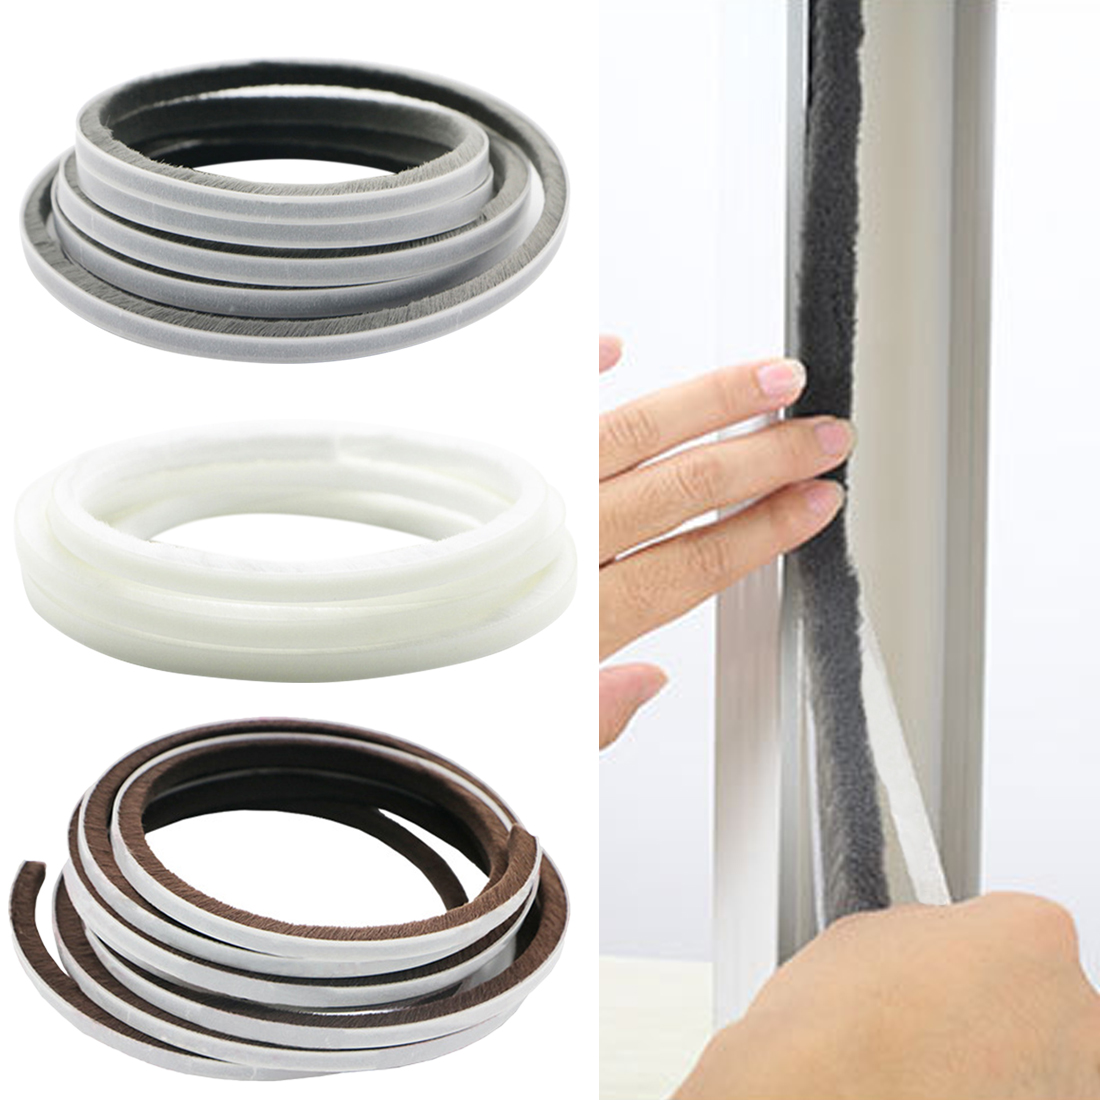 Draught Excluder Brush Pile Seal Film Door Window Self Adhesive Sealing Strip